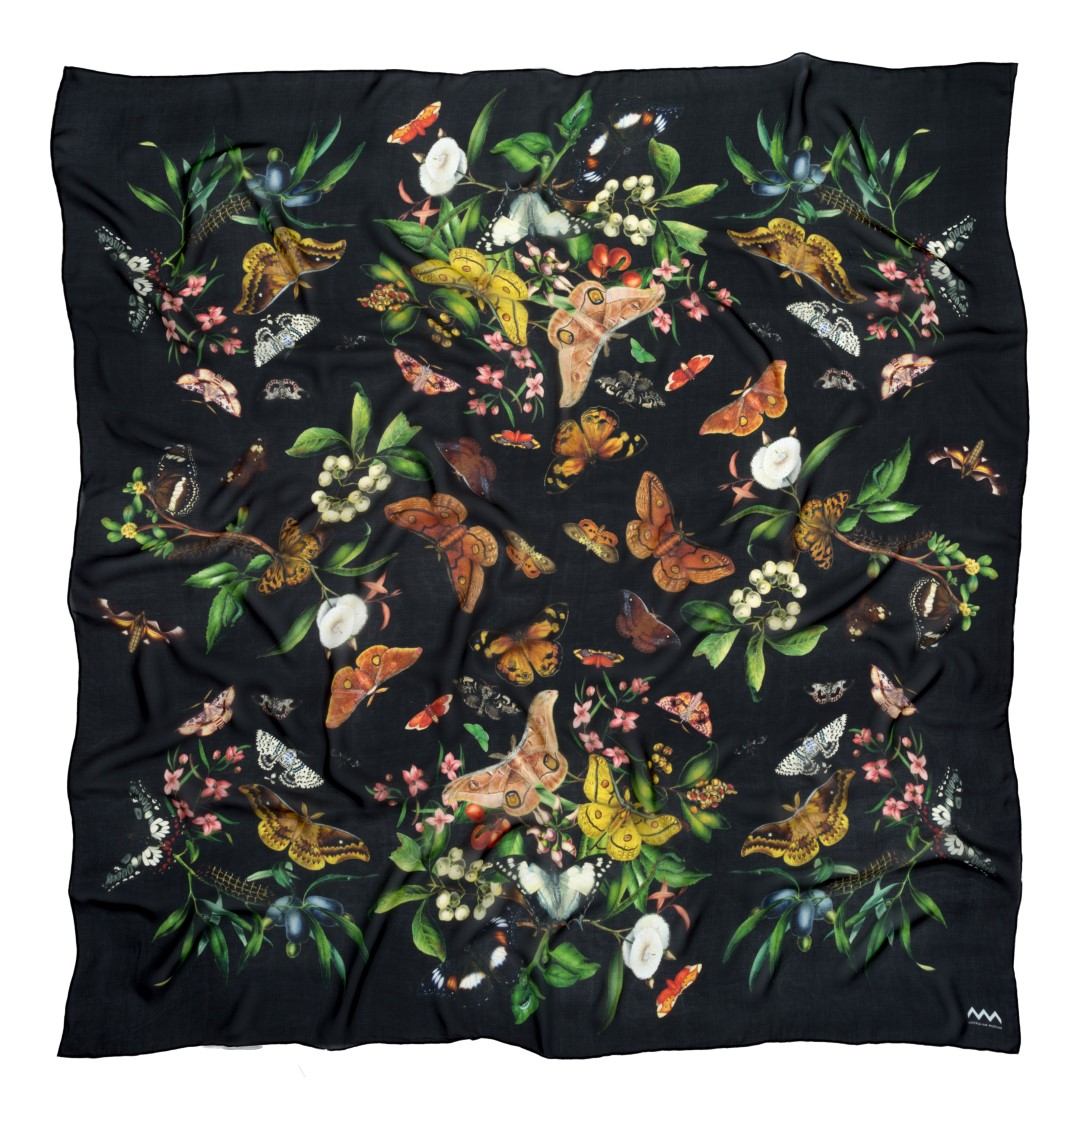 Scott Sisters Specimen silk scarf in black for the Australian Museum